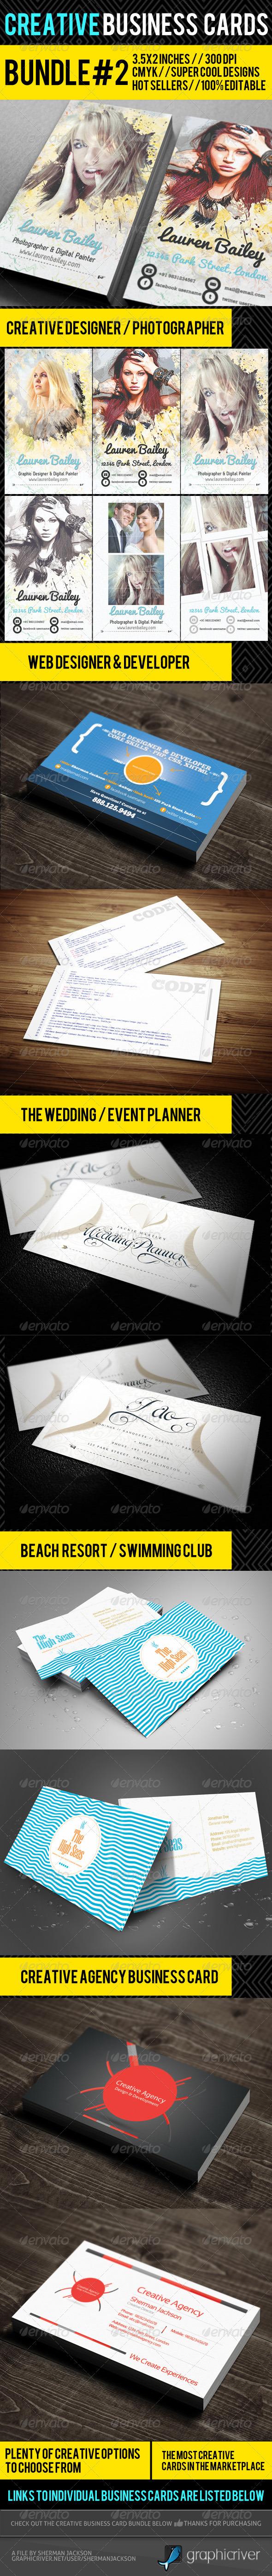 Creative Business Card Premium Bundle #2 - Creative Business Cards